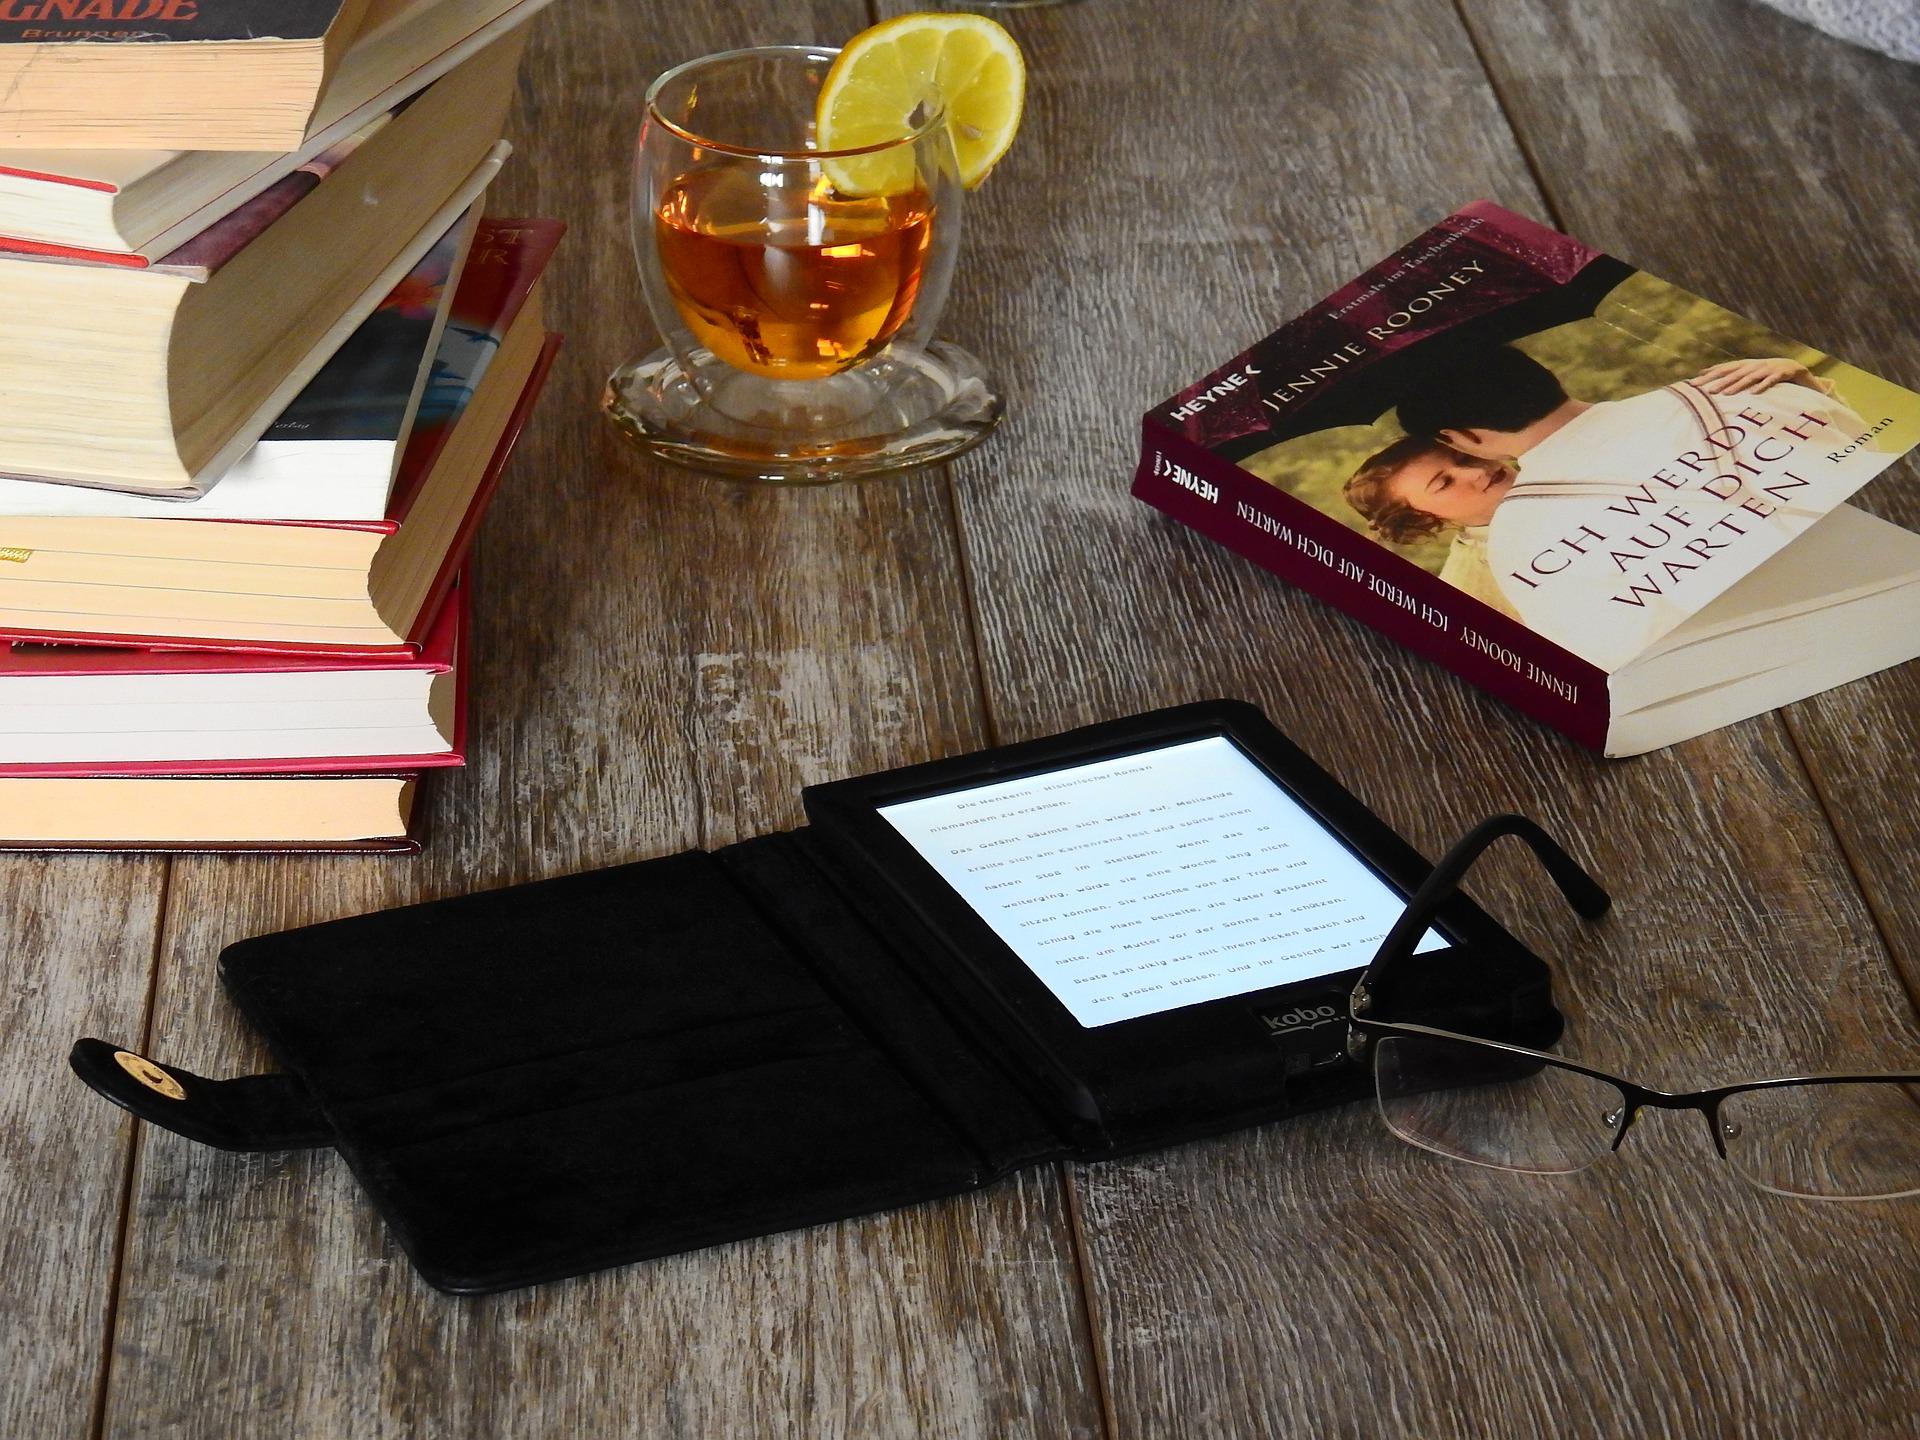 ebook book reading